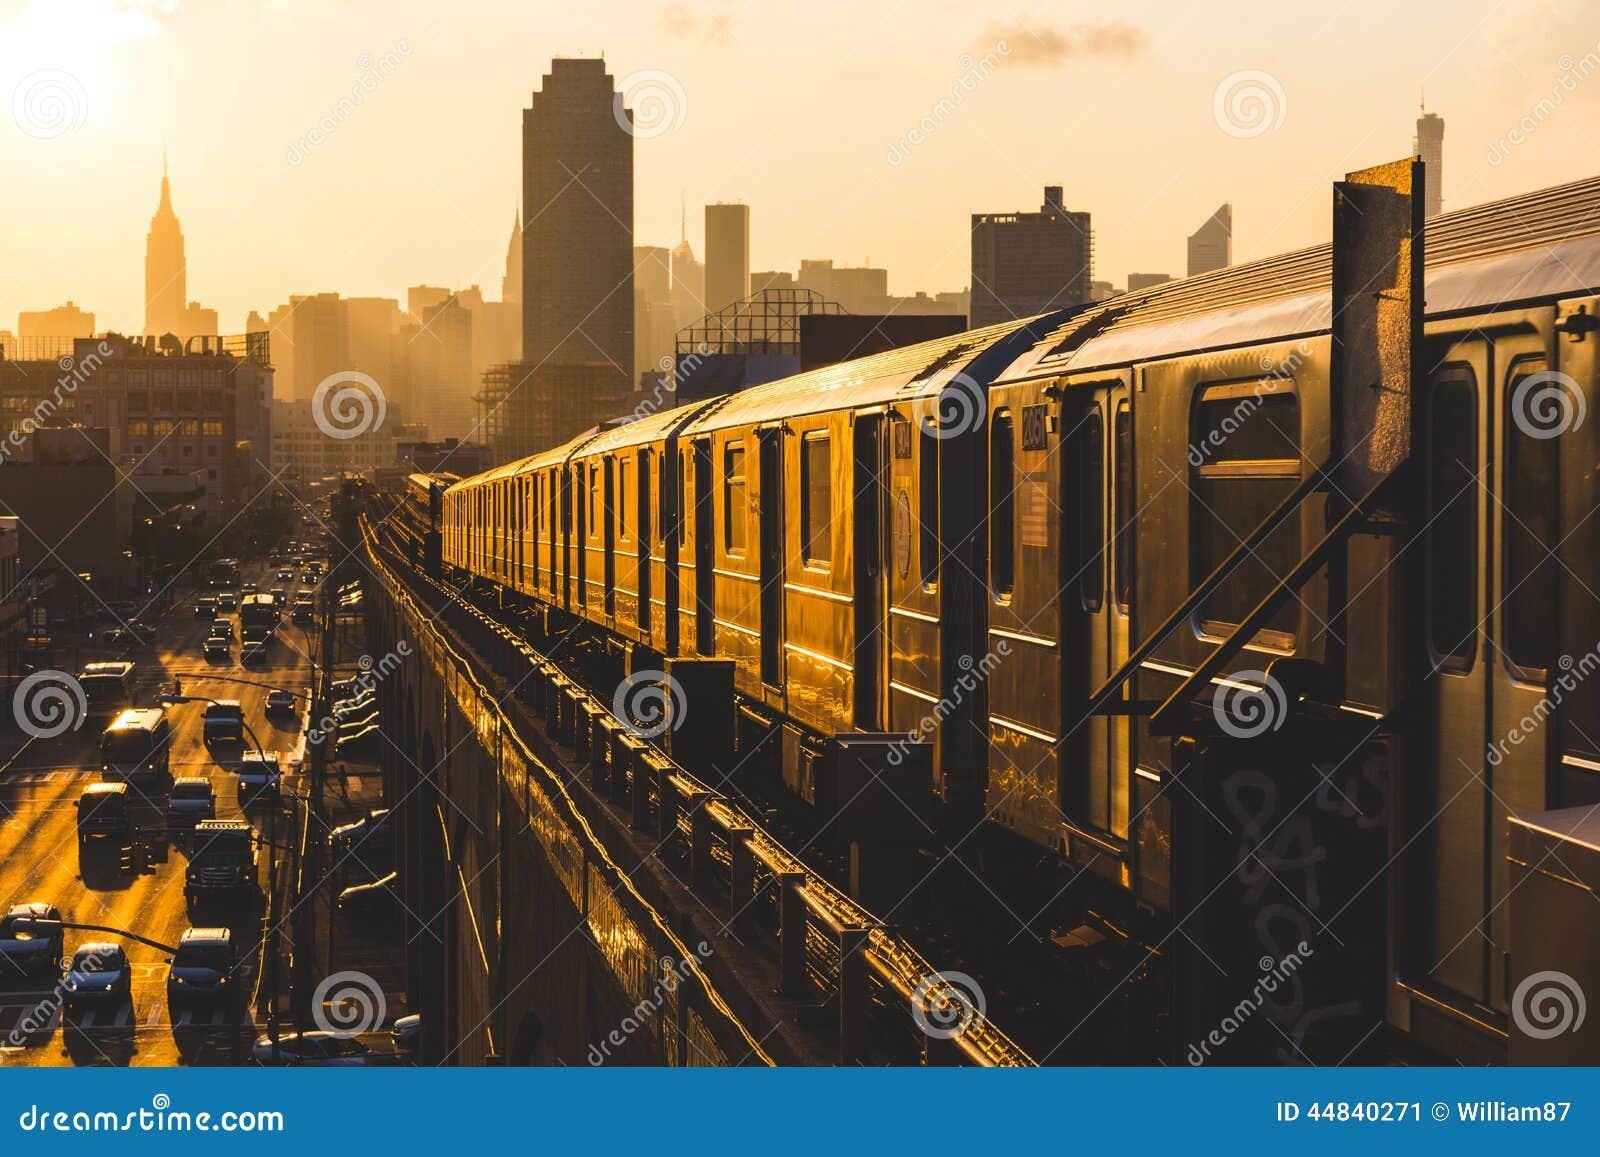 New York Subway Train Stock Image Image Of American 44840271